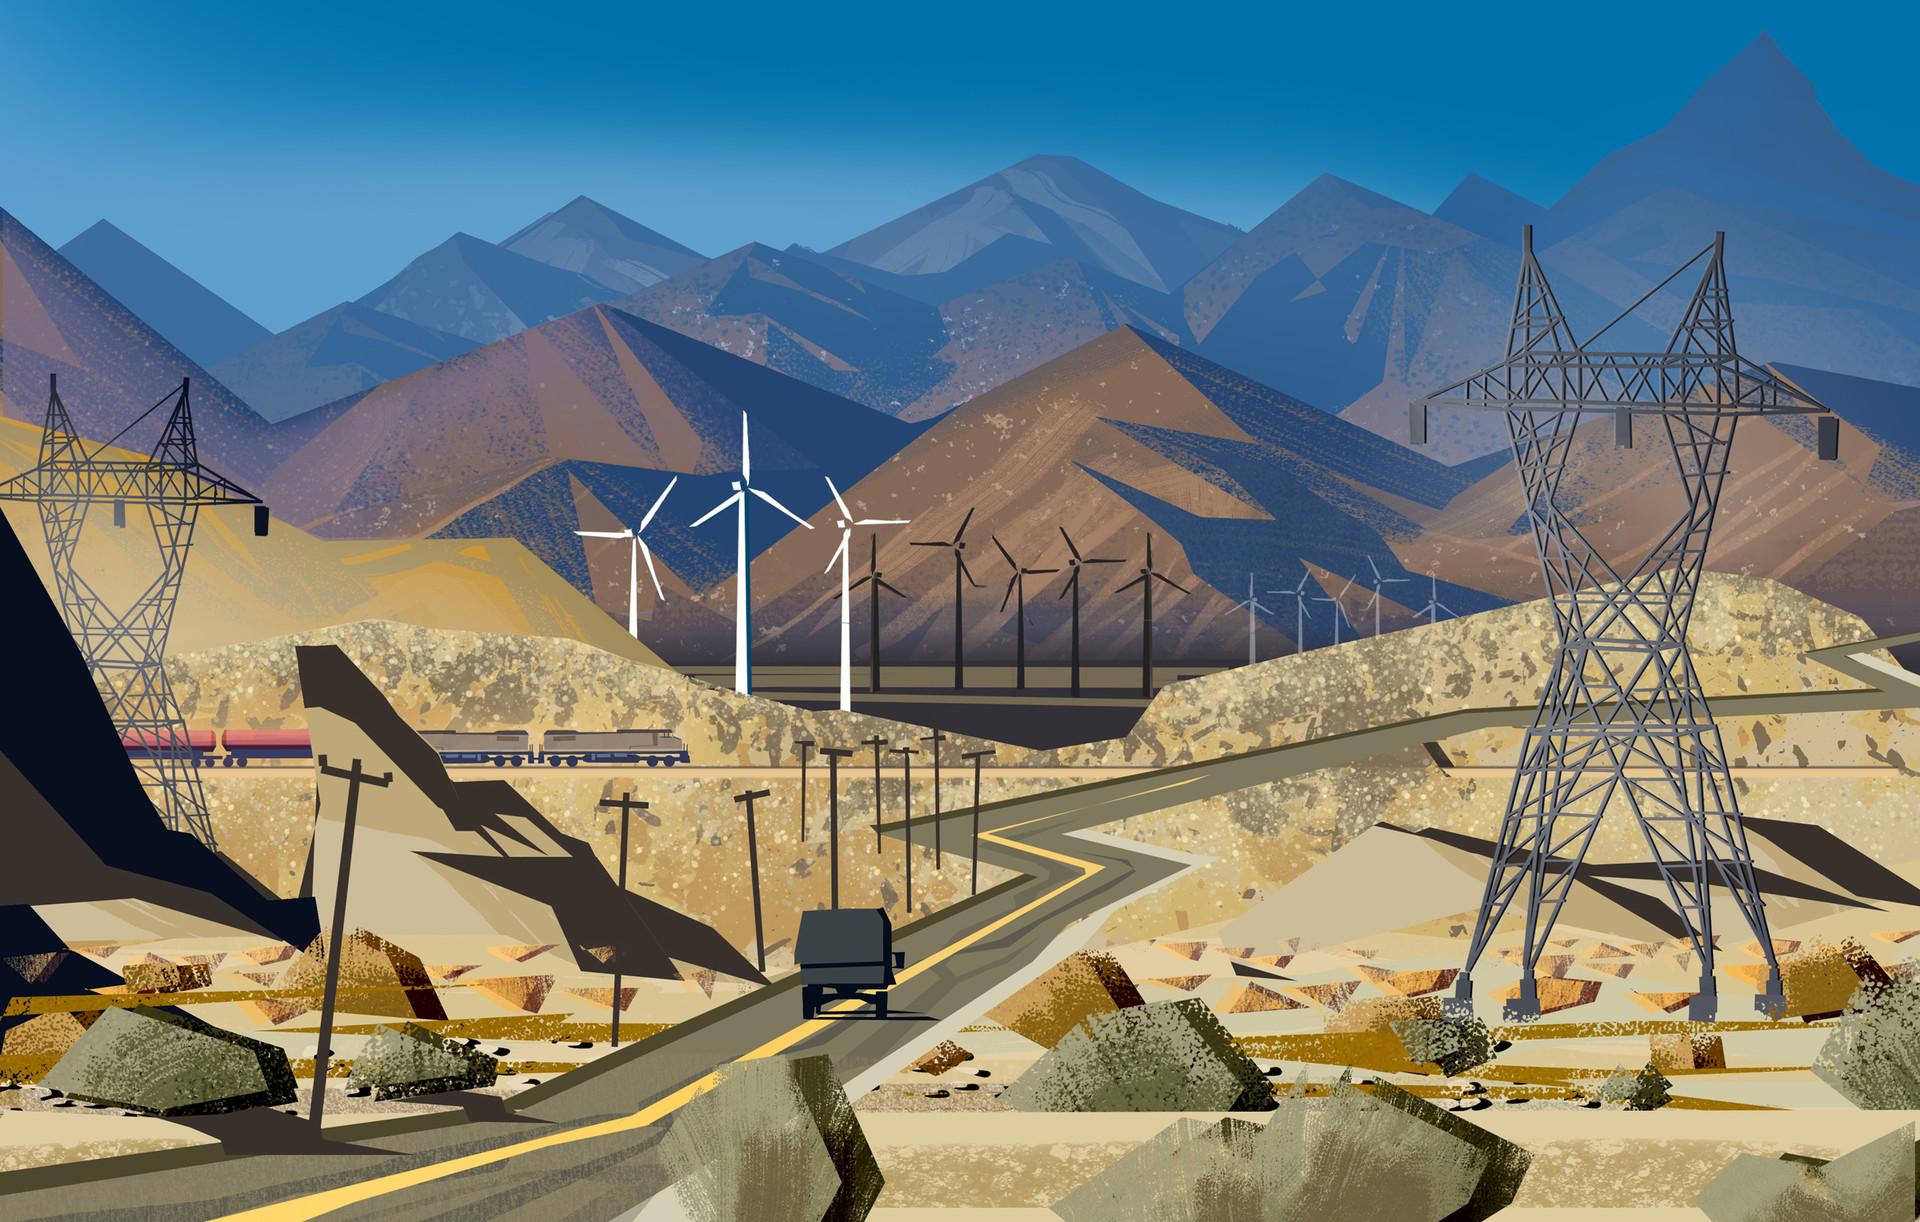 Harald ardeias wind mills